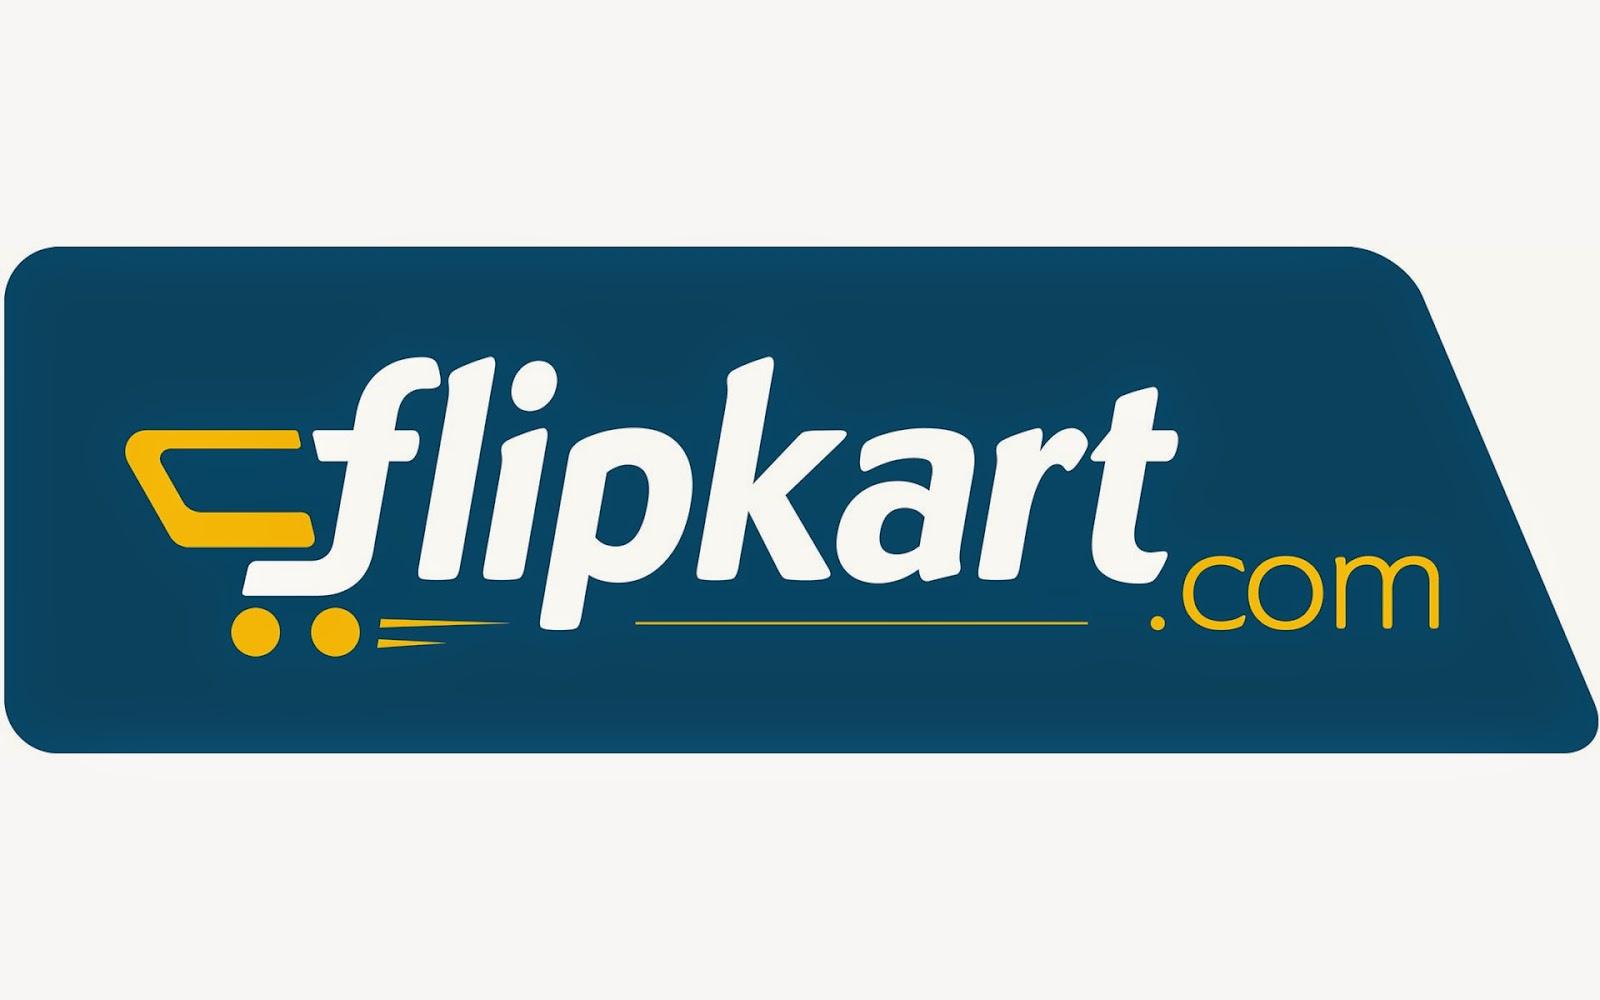 http://dl.flipkart.com/dl/movies/tv-show/pr?p%5B0%5D=facets.language%255B%255D%3DHindi&p%5B1%5D=sort%3Dfeatured&sid=4kt%2C3lz%2C9us&affid=kheteshwa